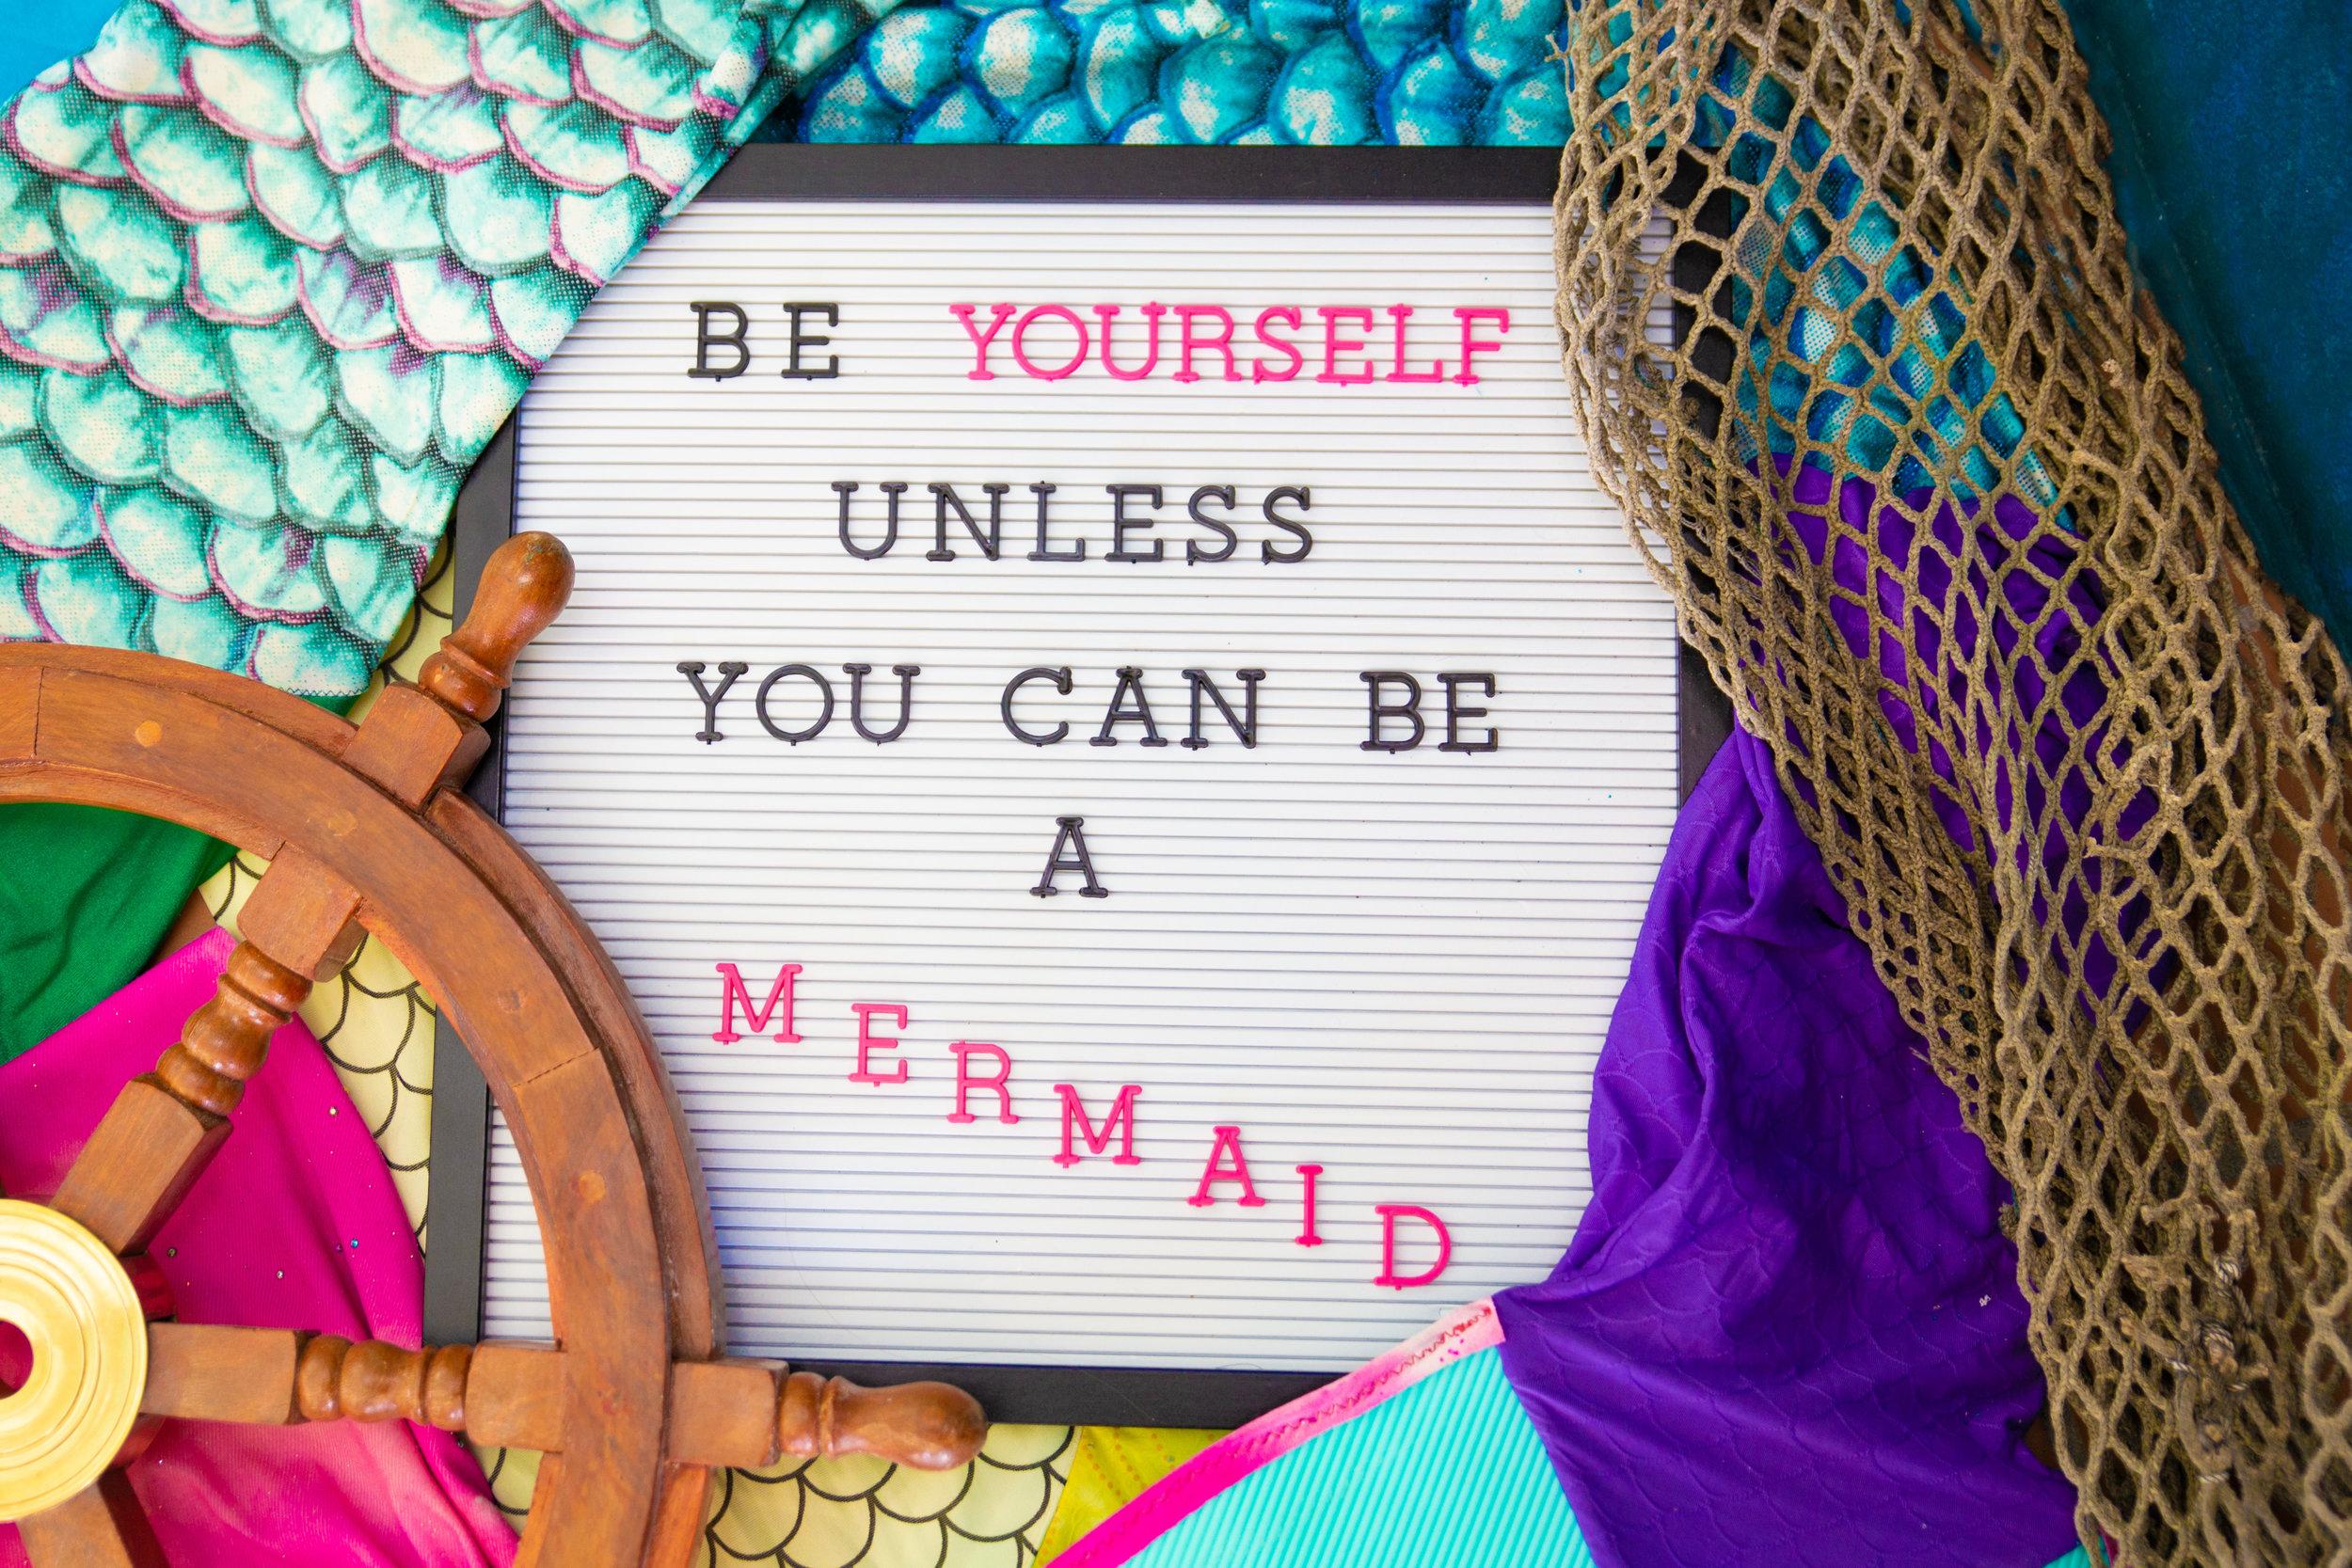 Mermaid cove- 2019-33.jpg